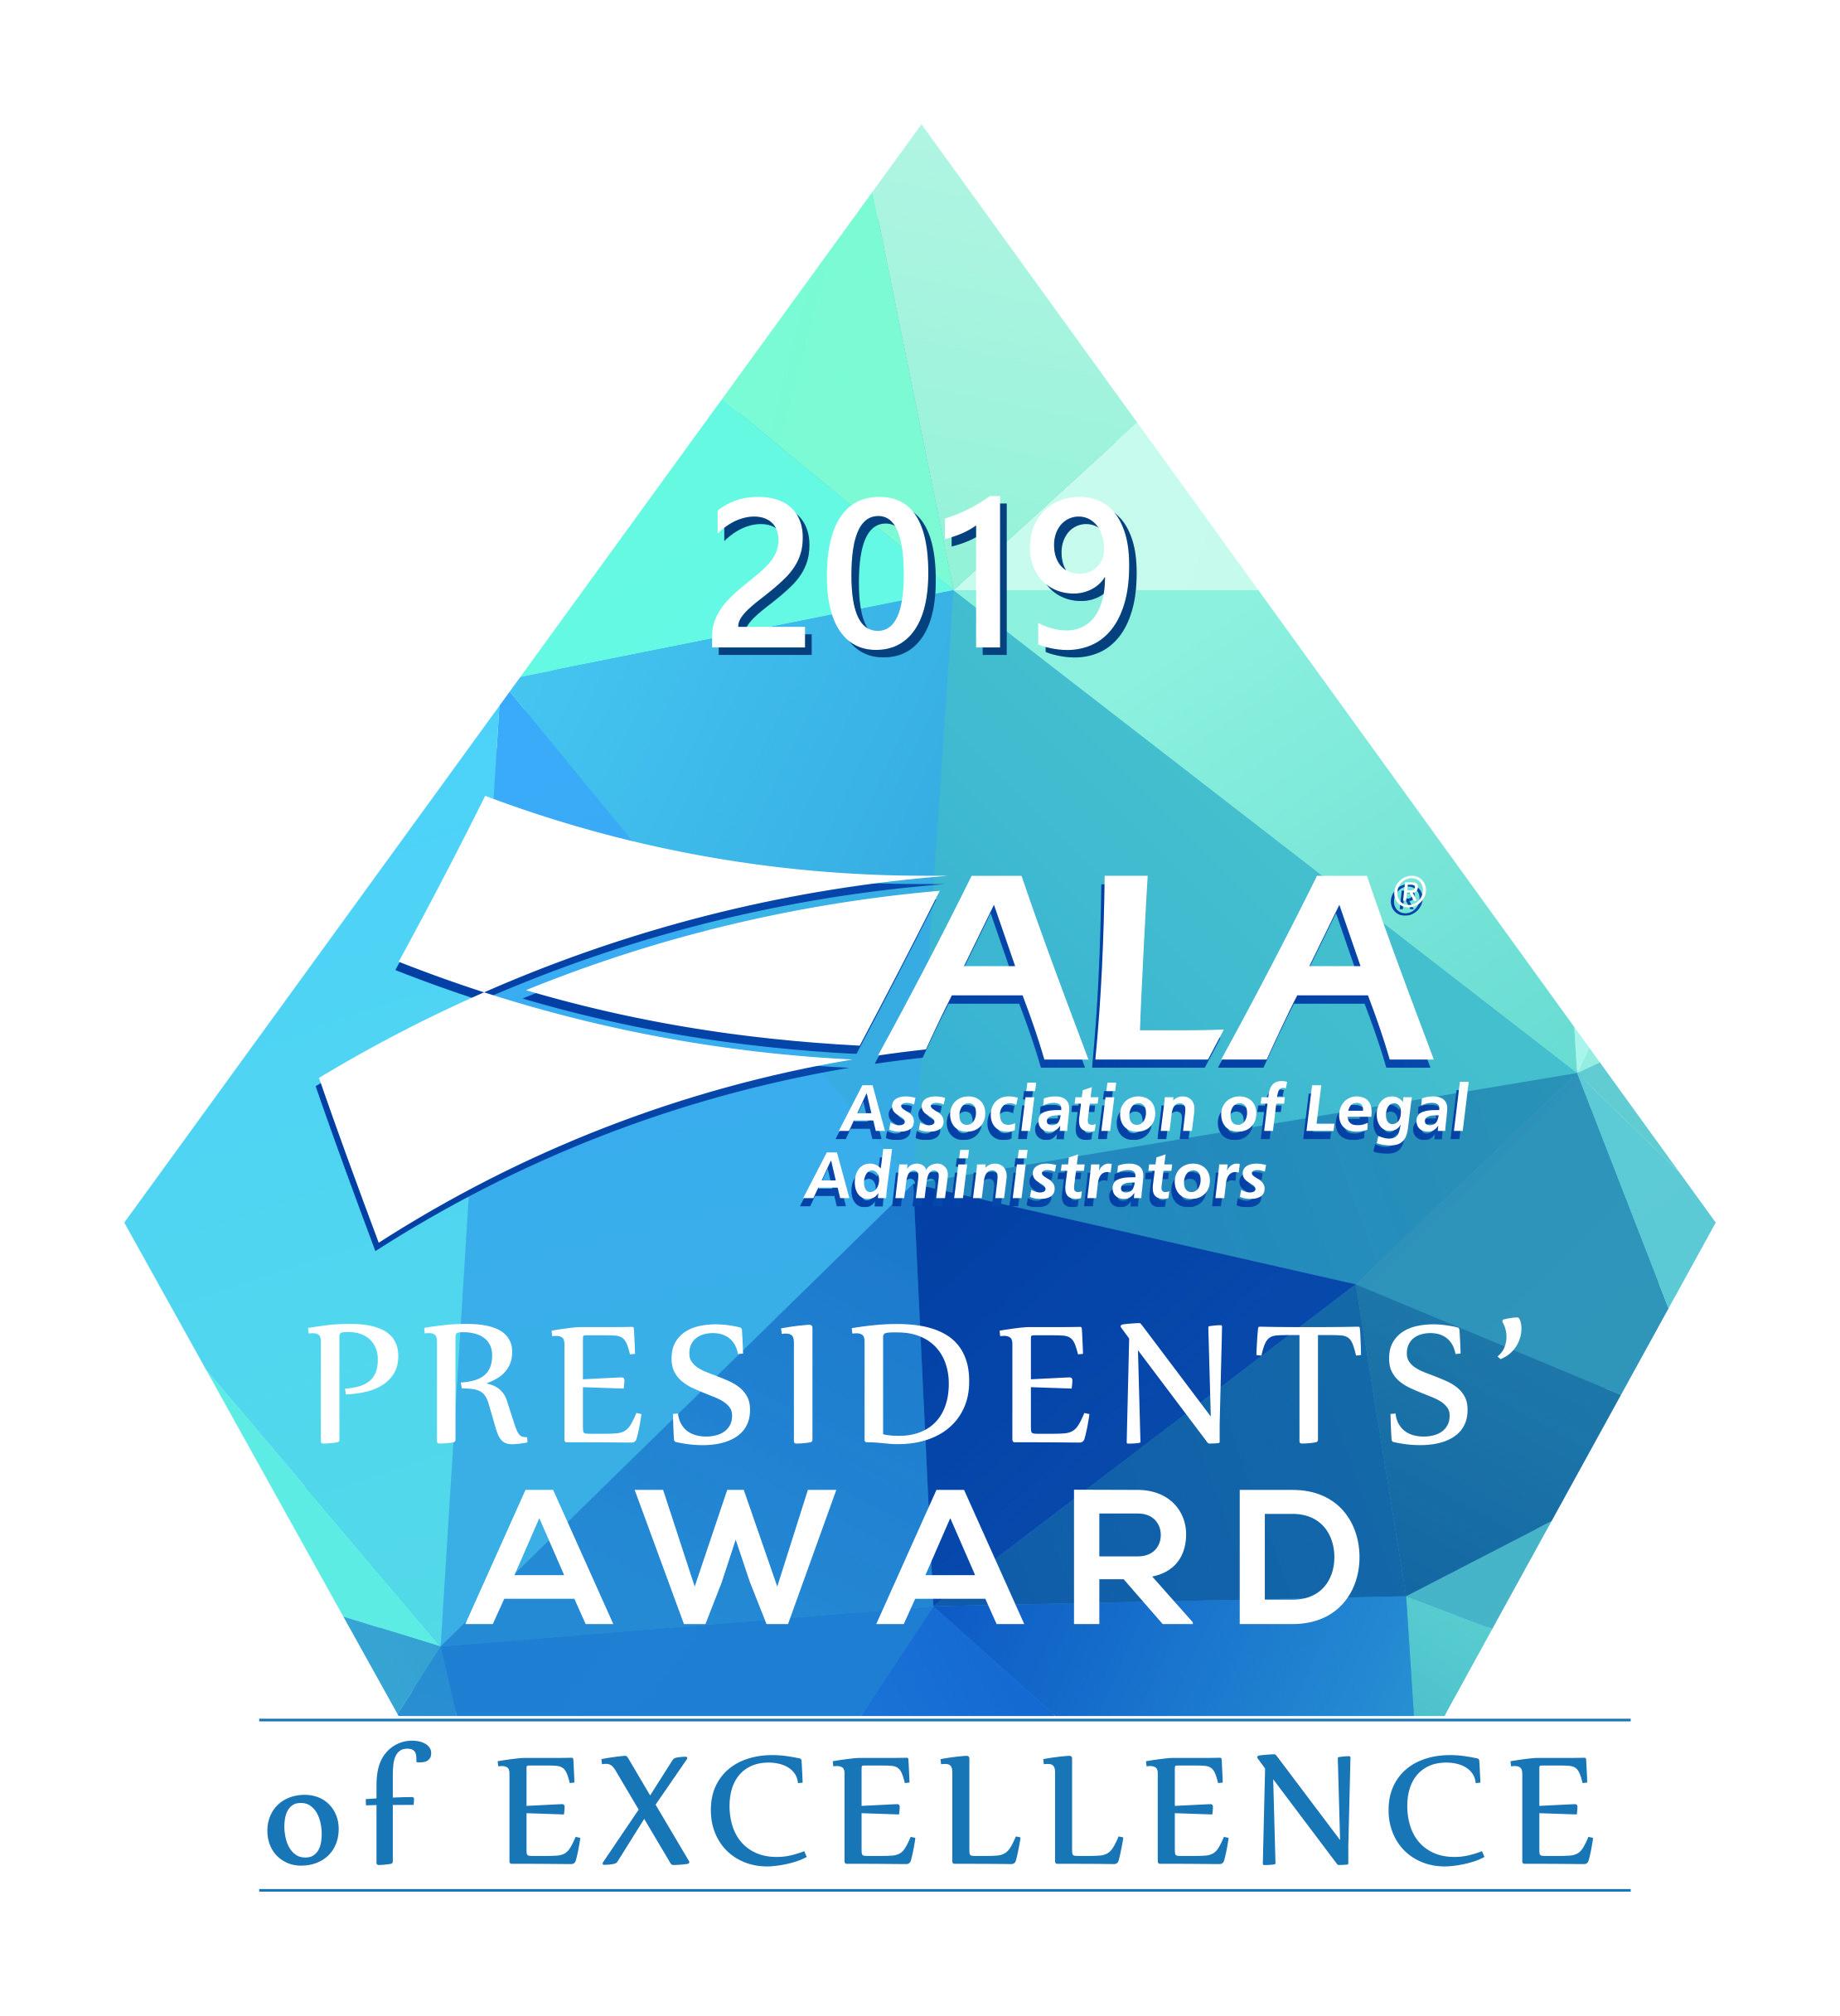 ALA2019-Presidents-Award-Excellence-514-x-530-EPS